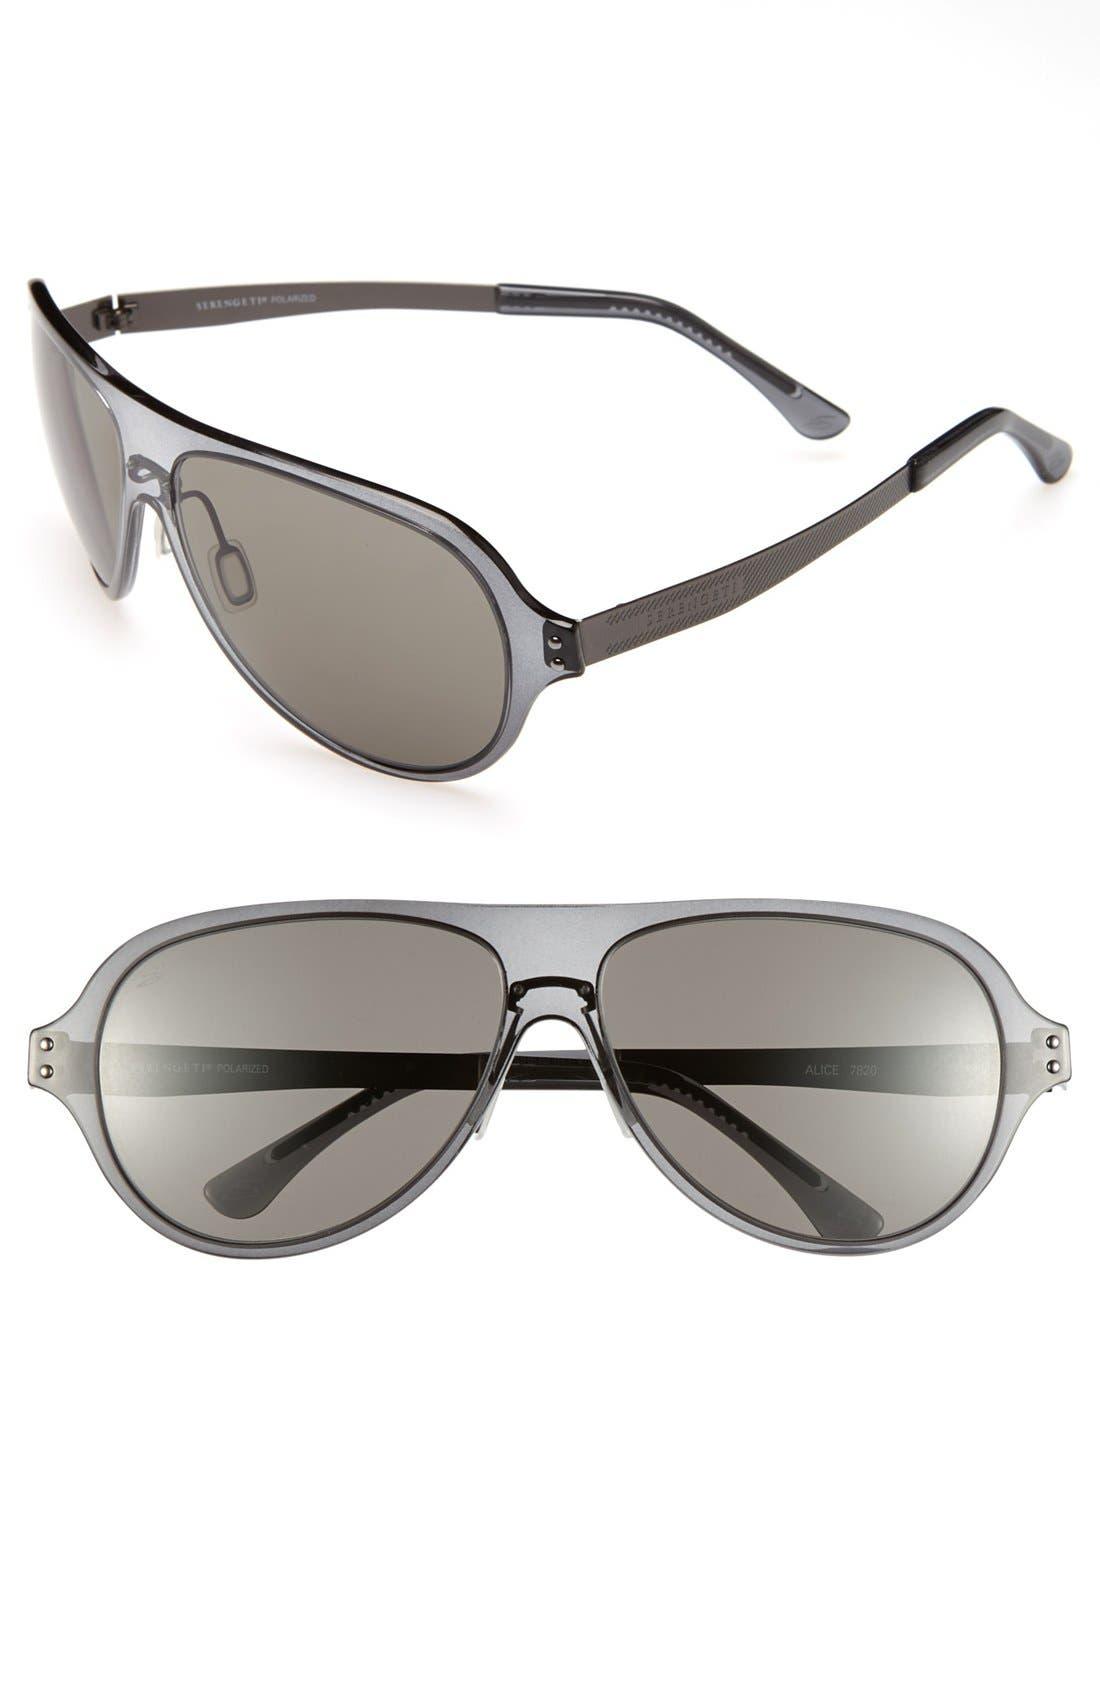 Alternate Image 1 Selected - Serengeti 'Alice' 67mm Polarized Aviator Sunglasses